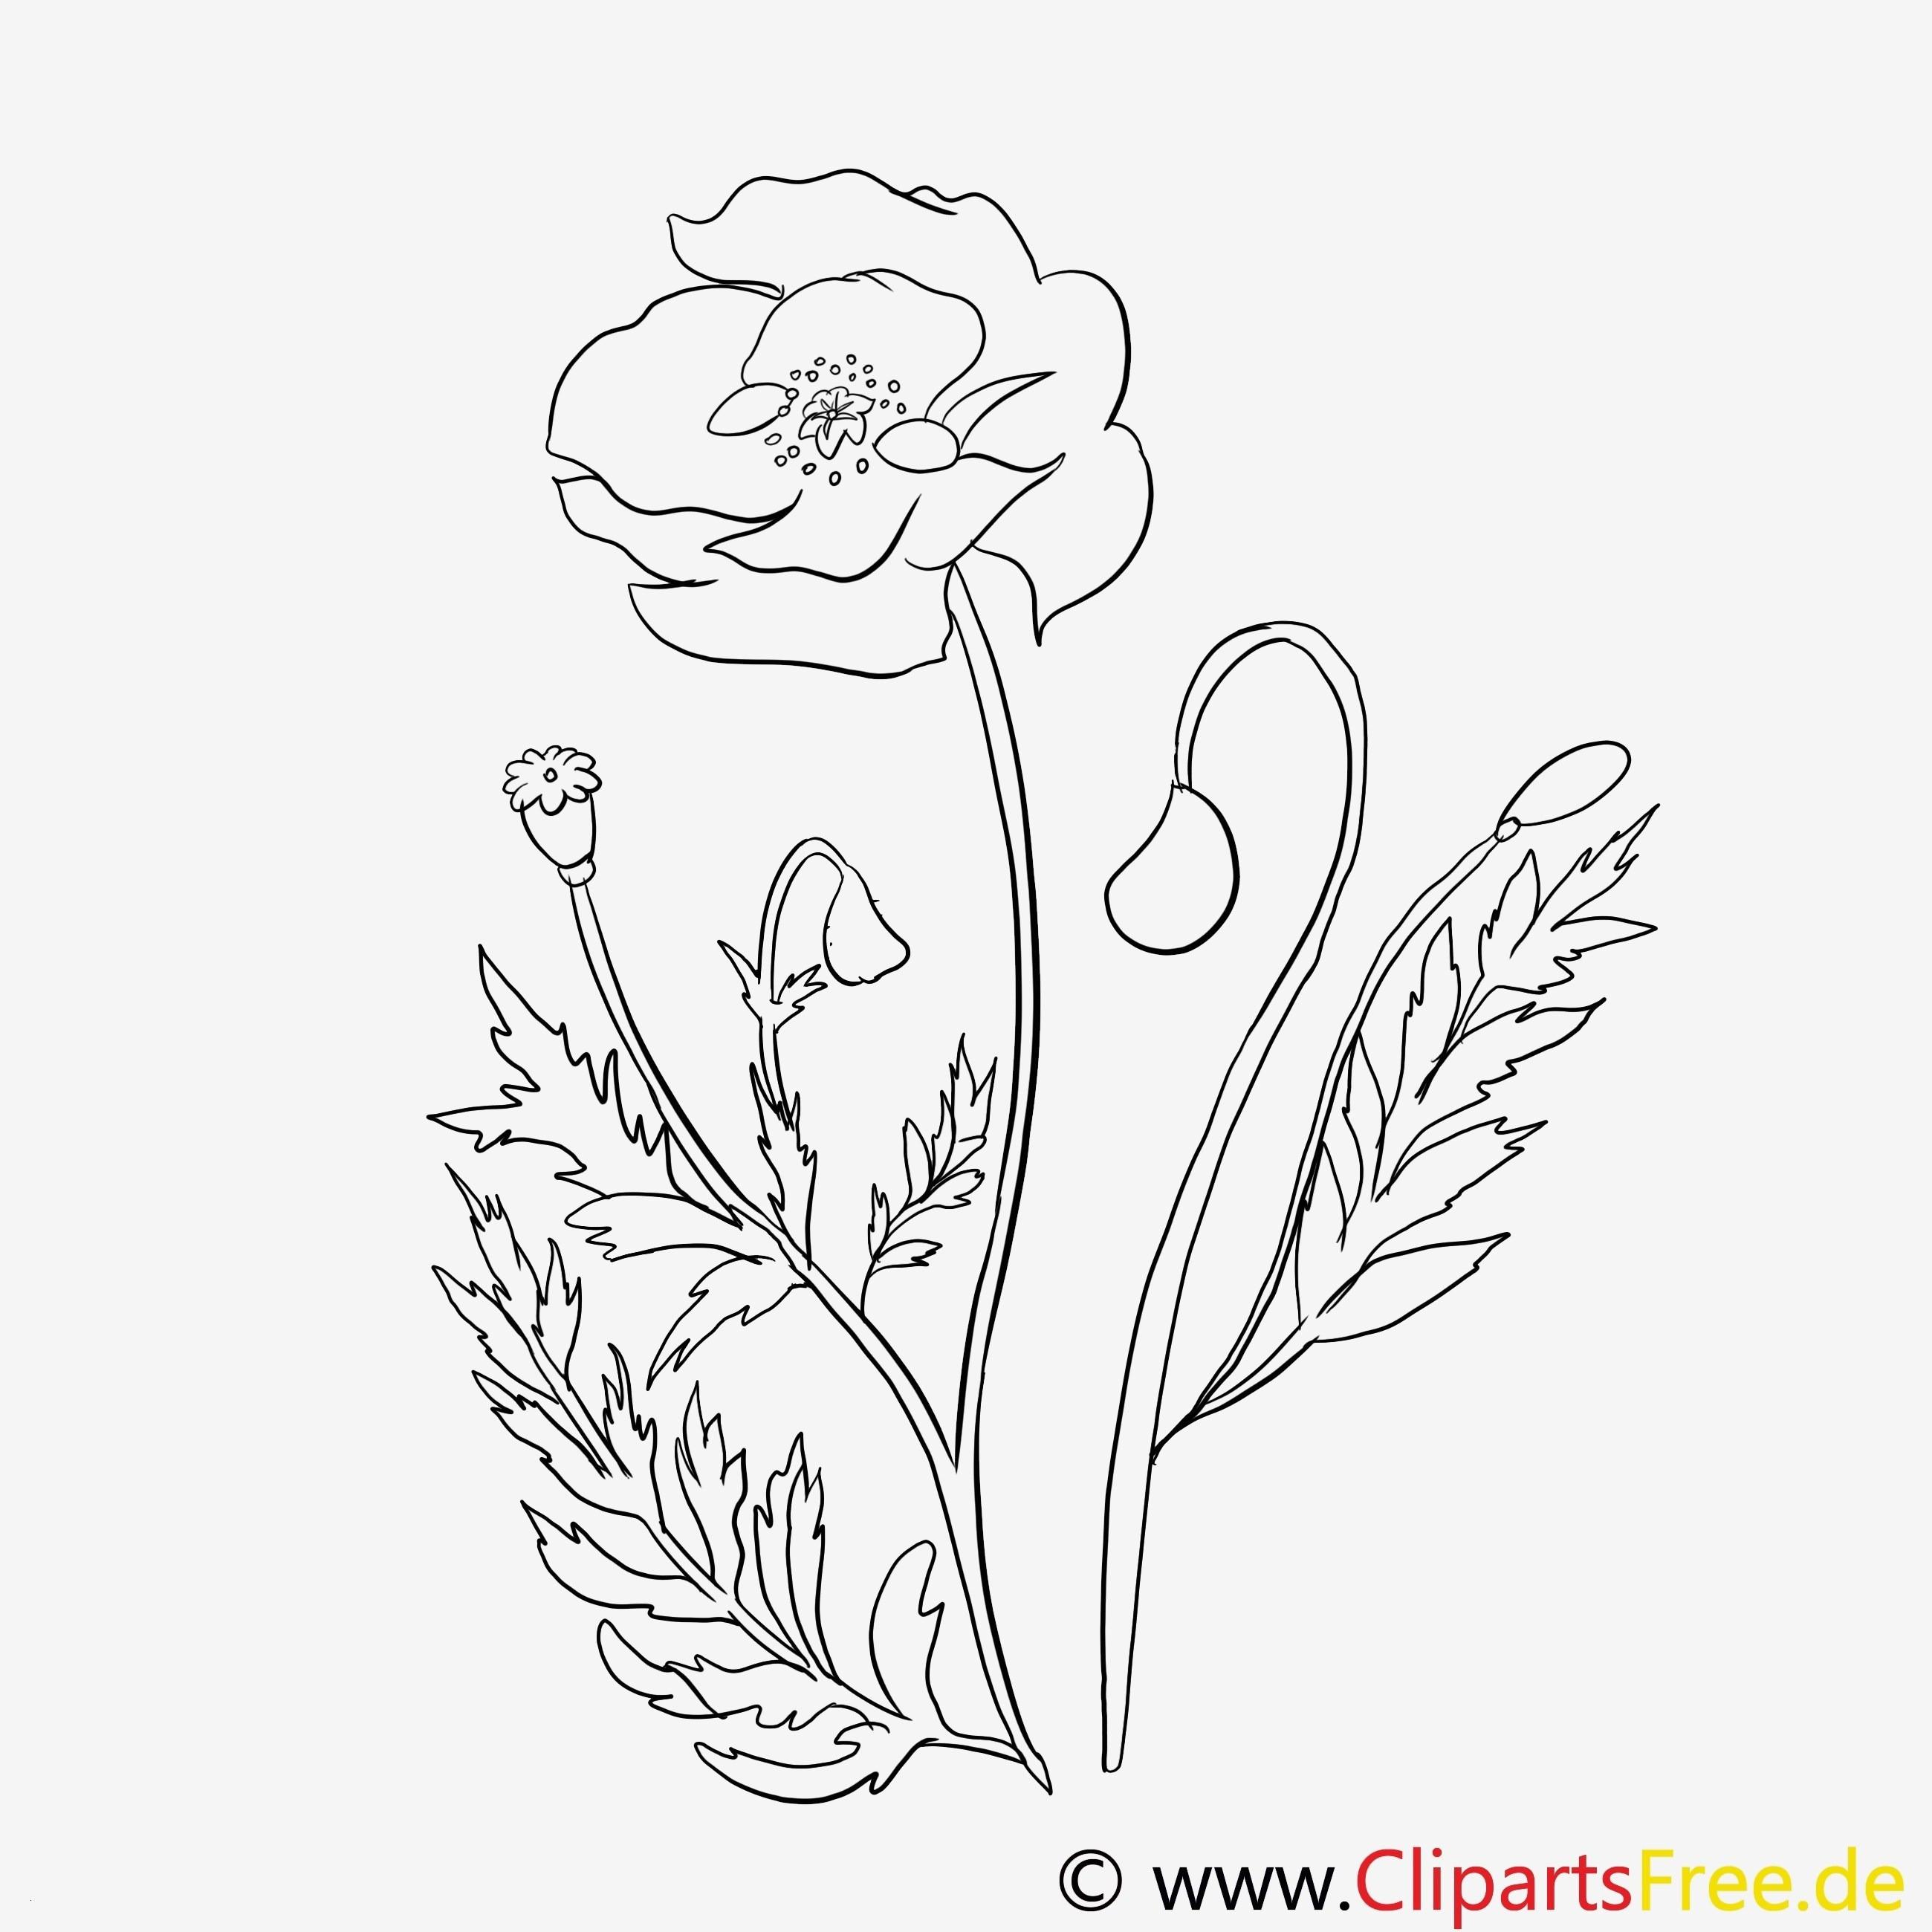 Rosen Zum Ausmalen Einzigartig 35 Rosen Malvorlagen Scoredatscore Neu Ausmalbilder Mandala Rosen Stock